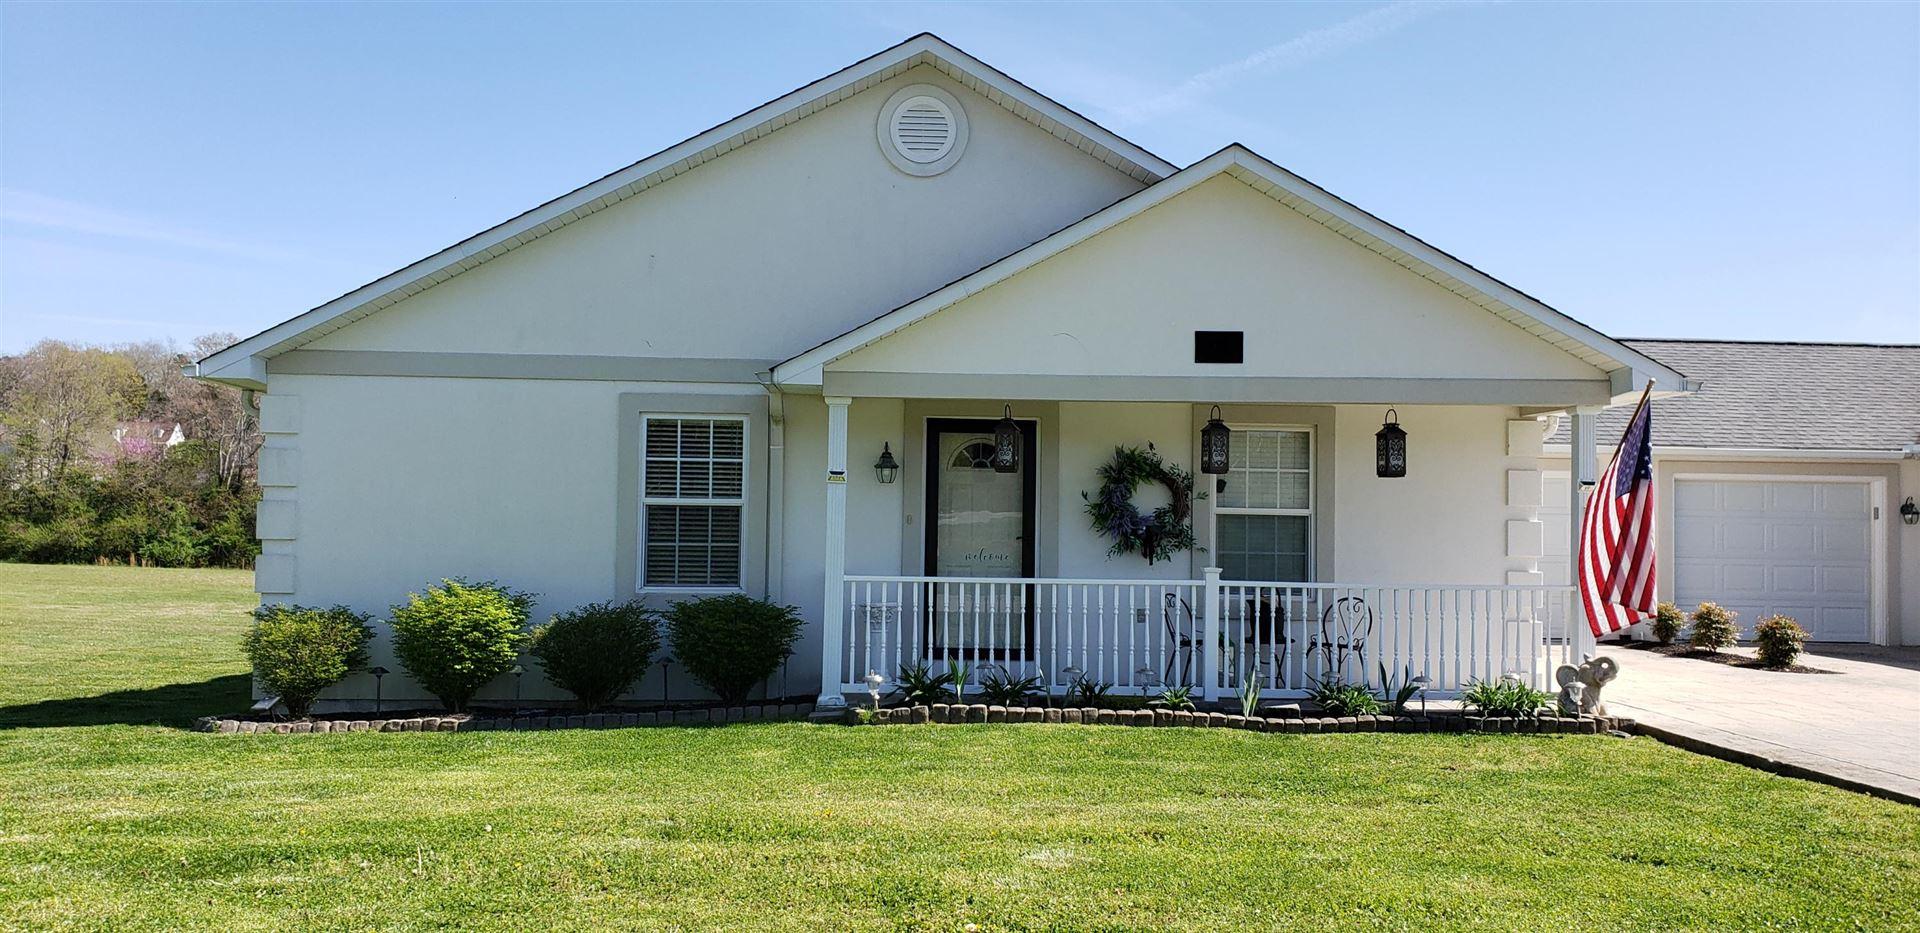 Photo for 109 Greystone Way, Kingston, TN 37763 (MLS # 1148824)